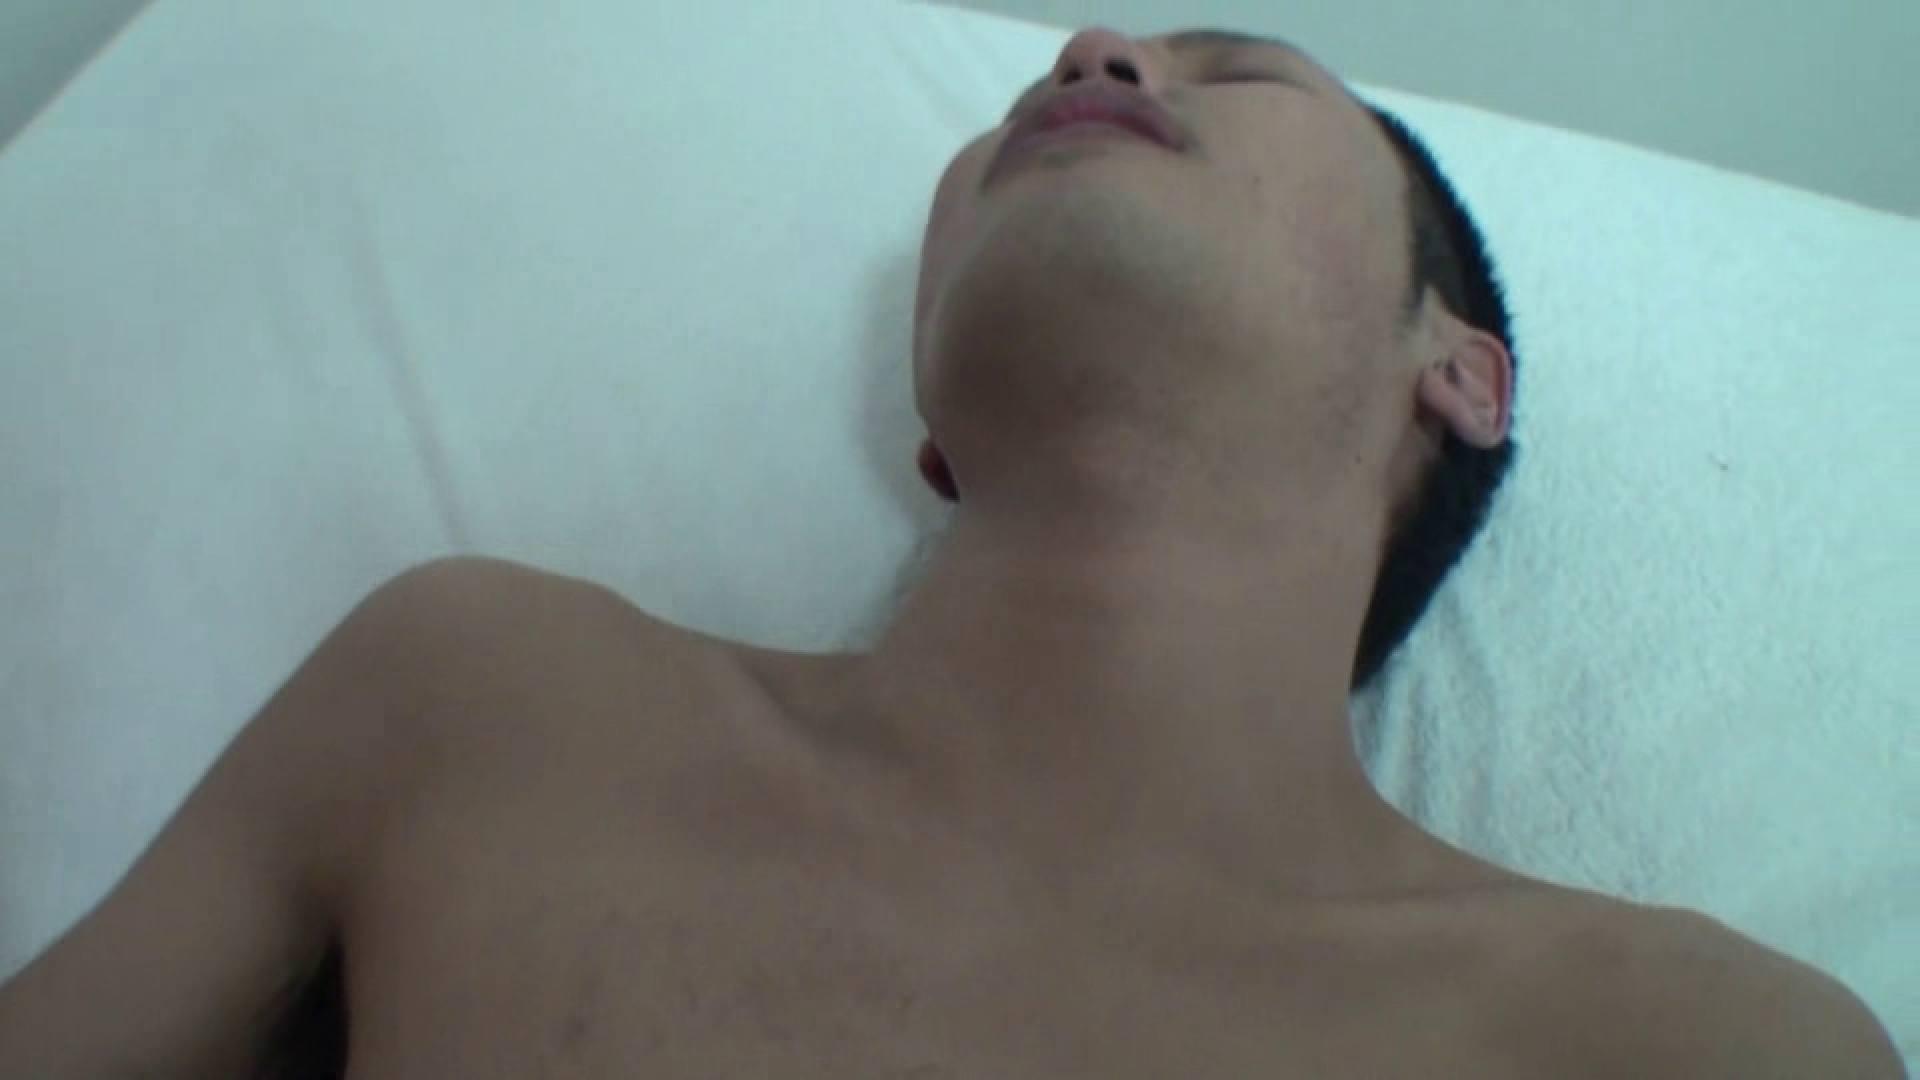 HD 良太と健二当たり前の日常 セックス編 VOL.03 セックス | 0  52pic 46